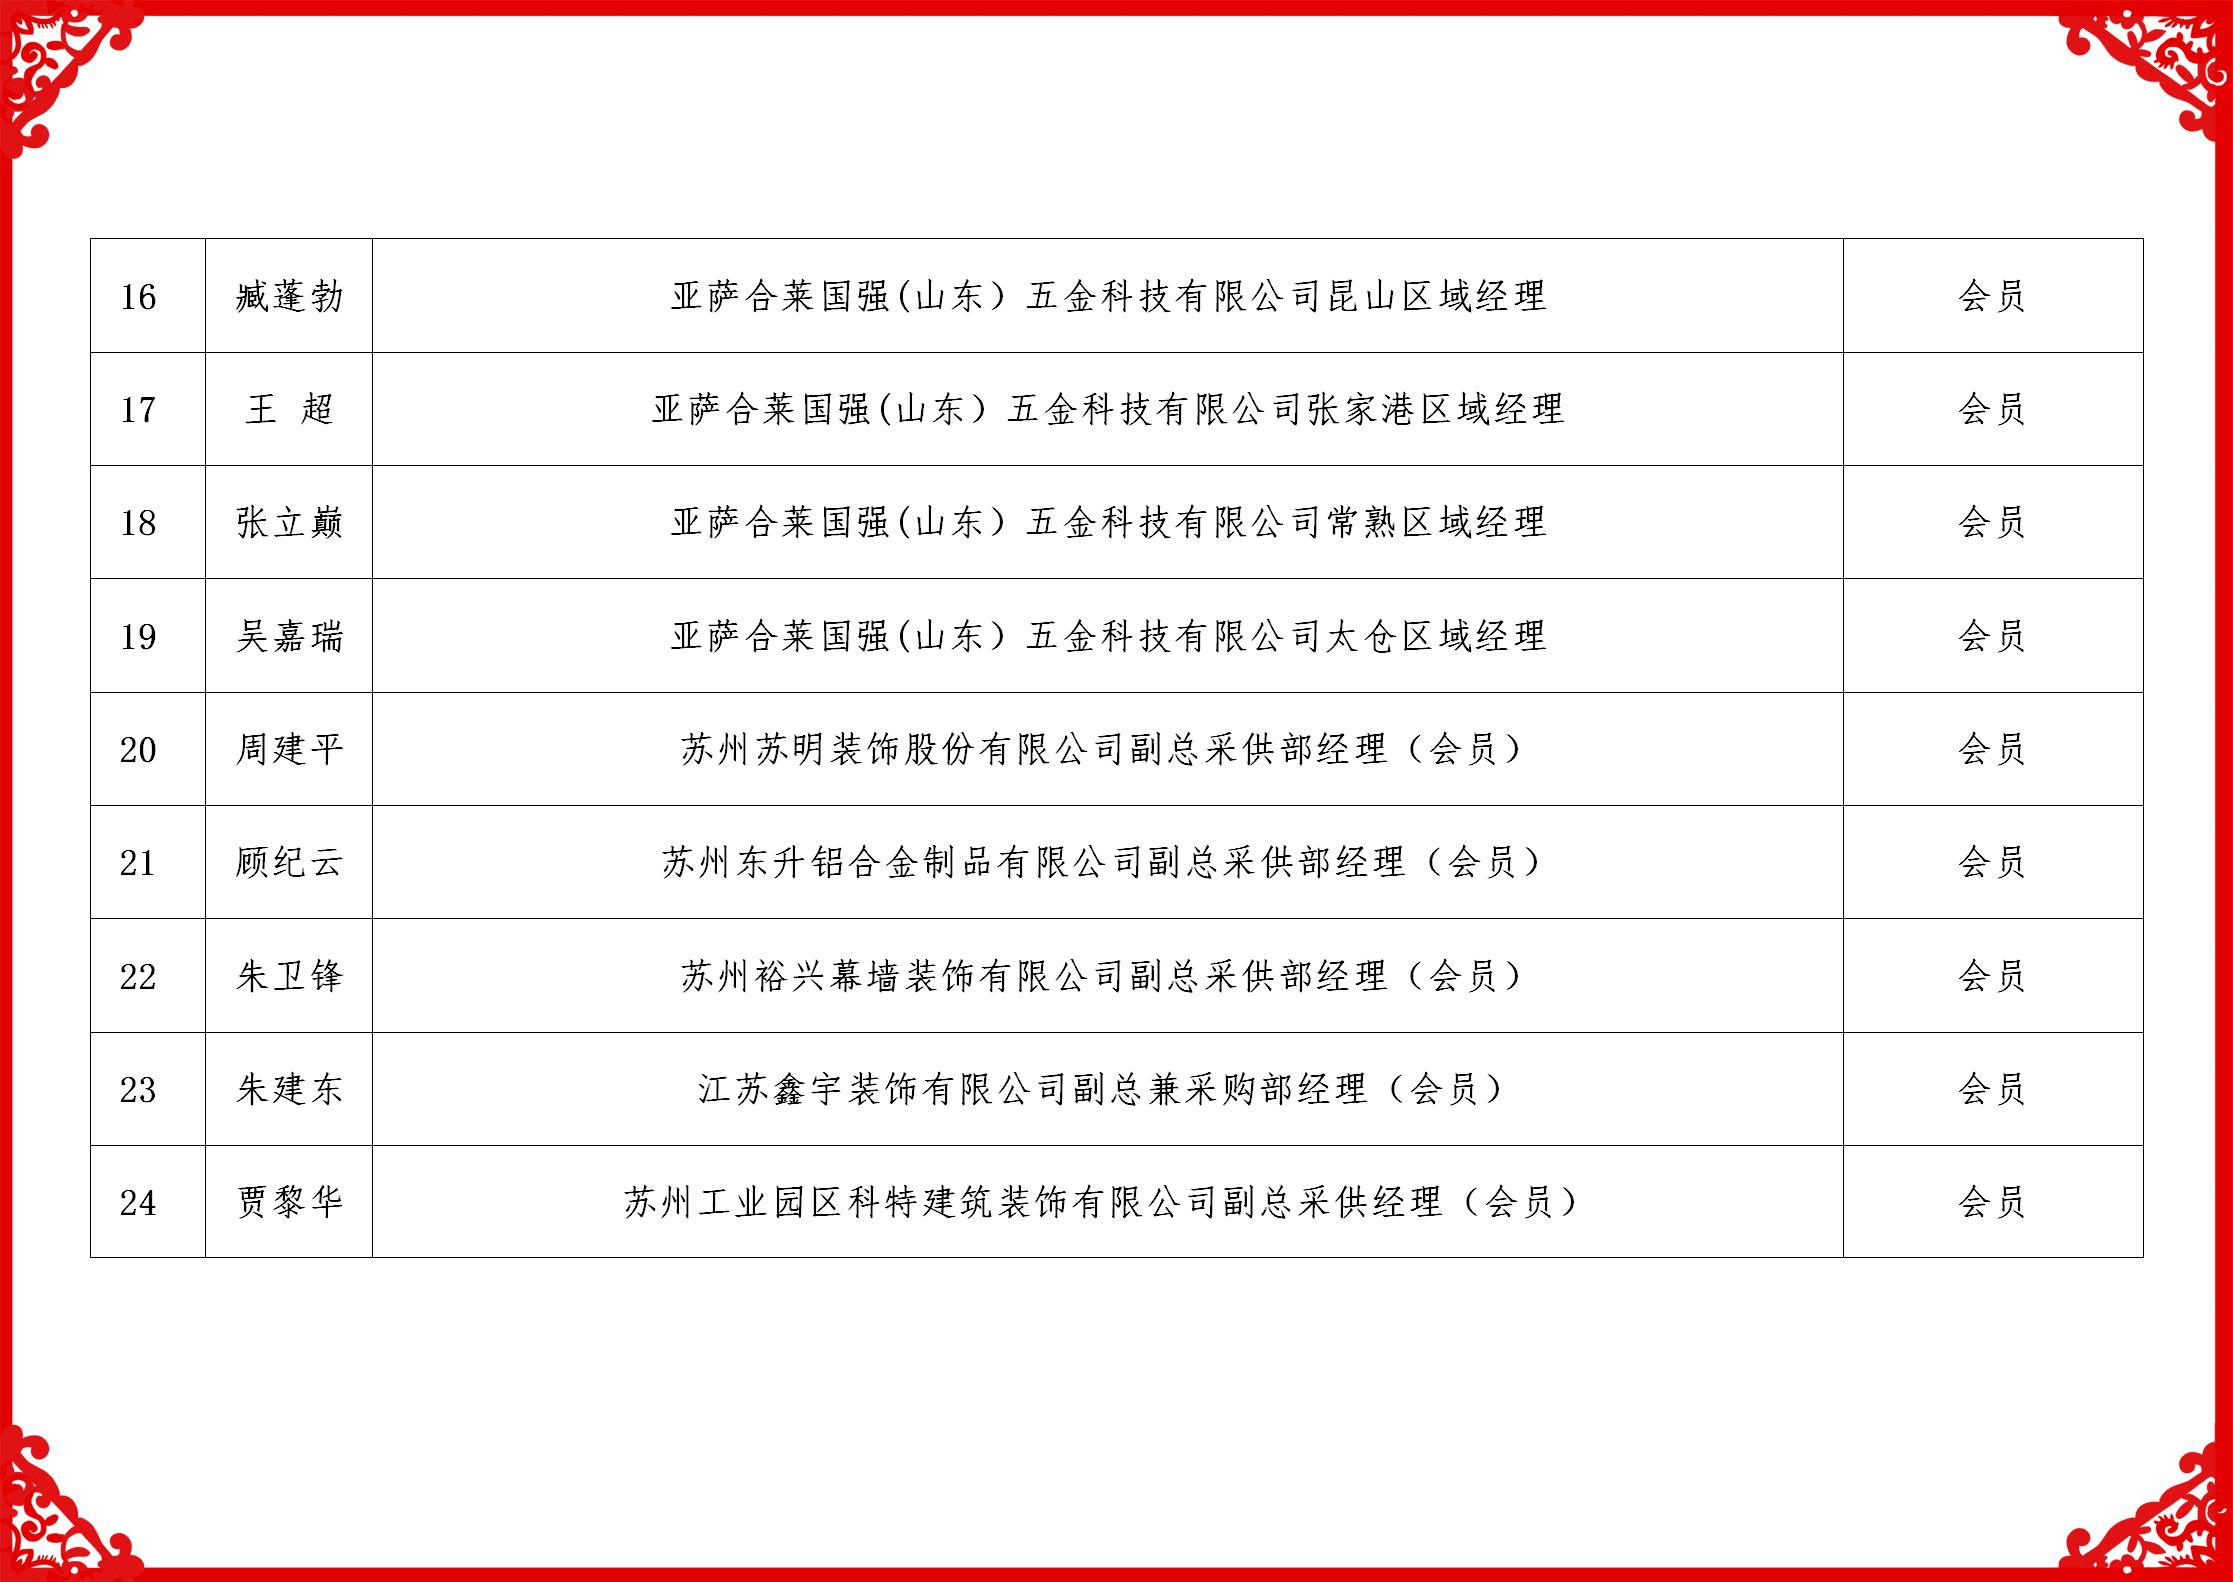 2019配套委名单_03